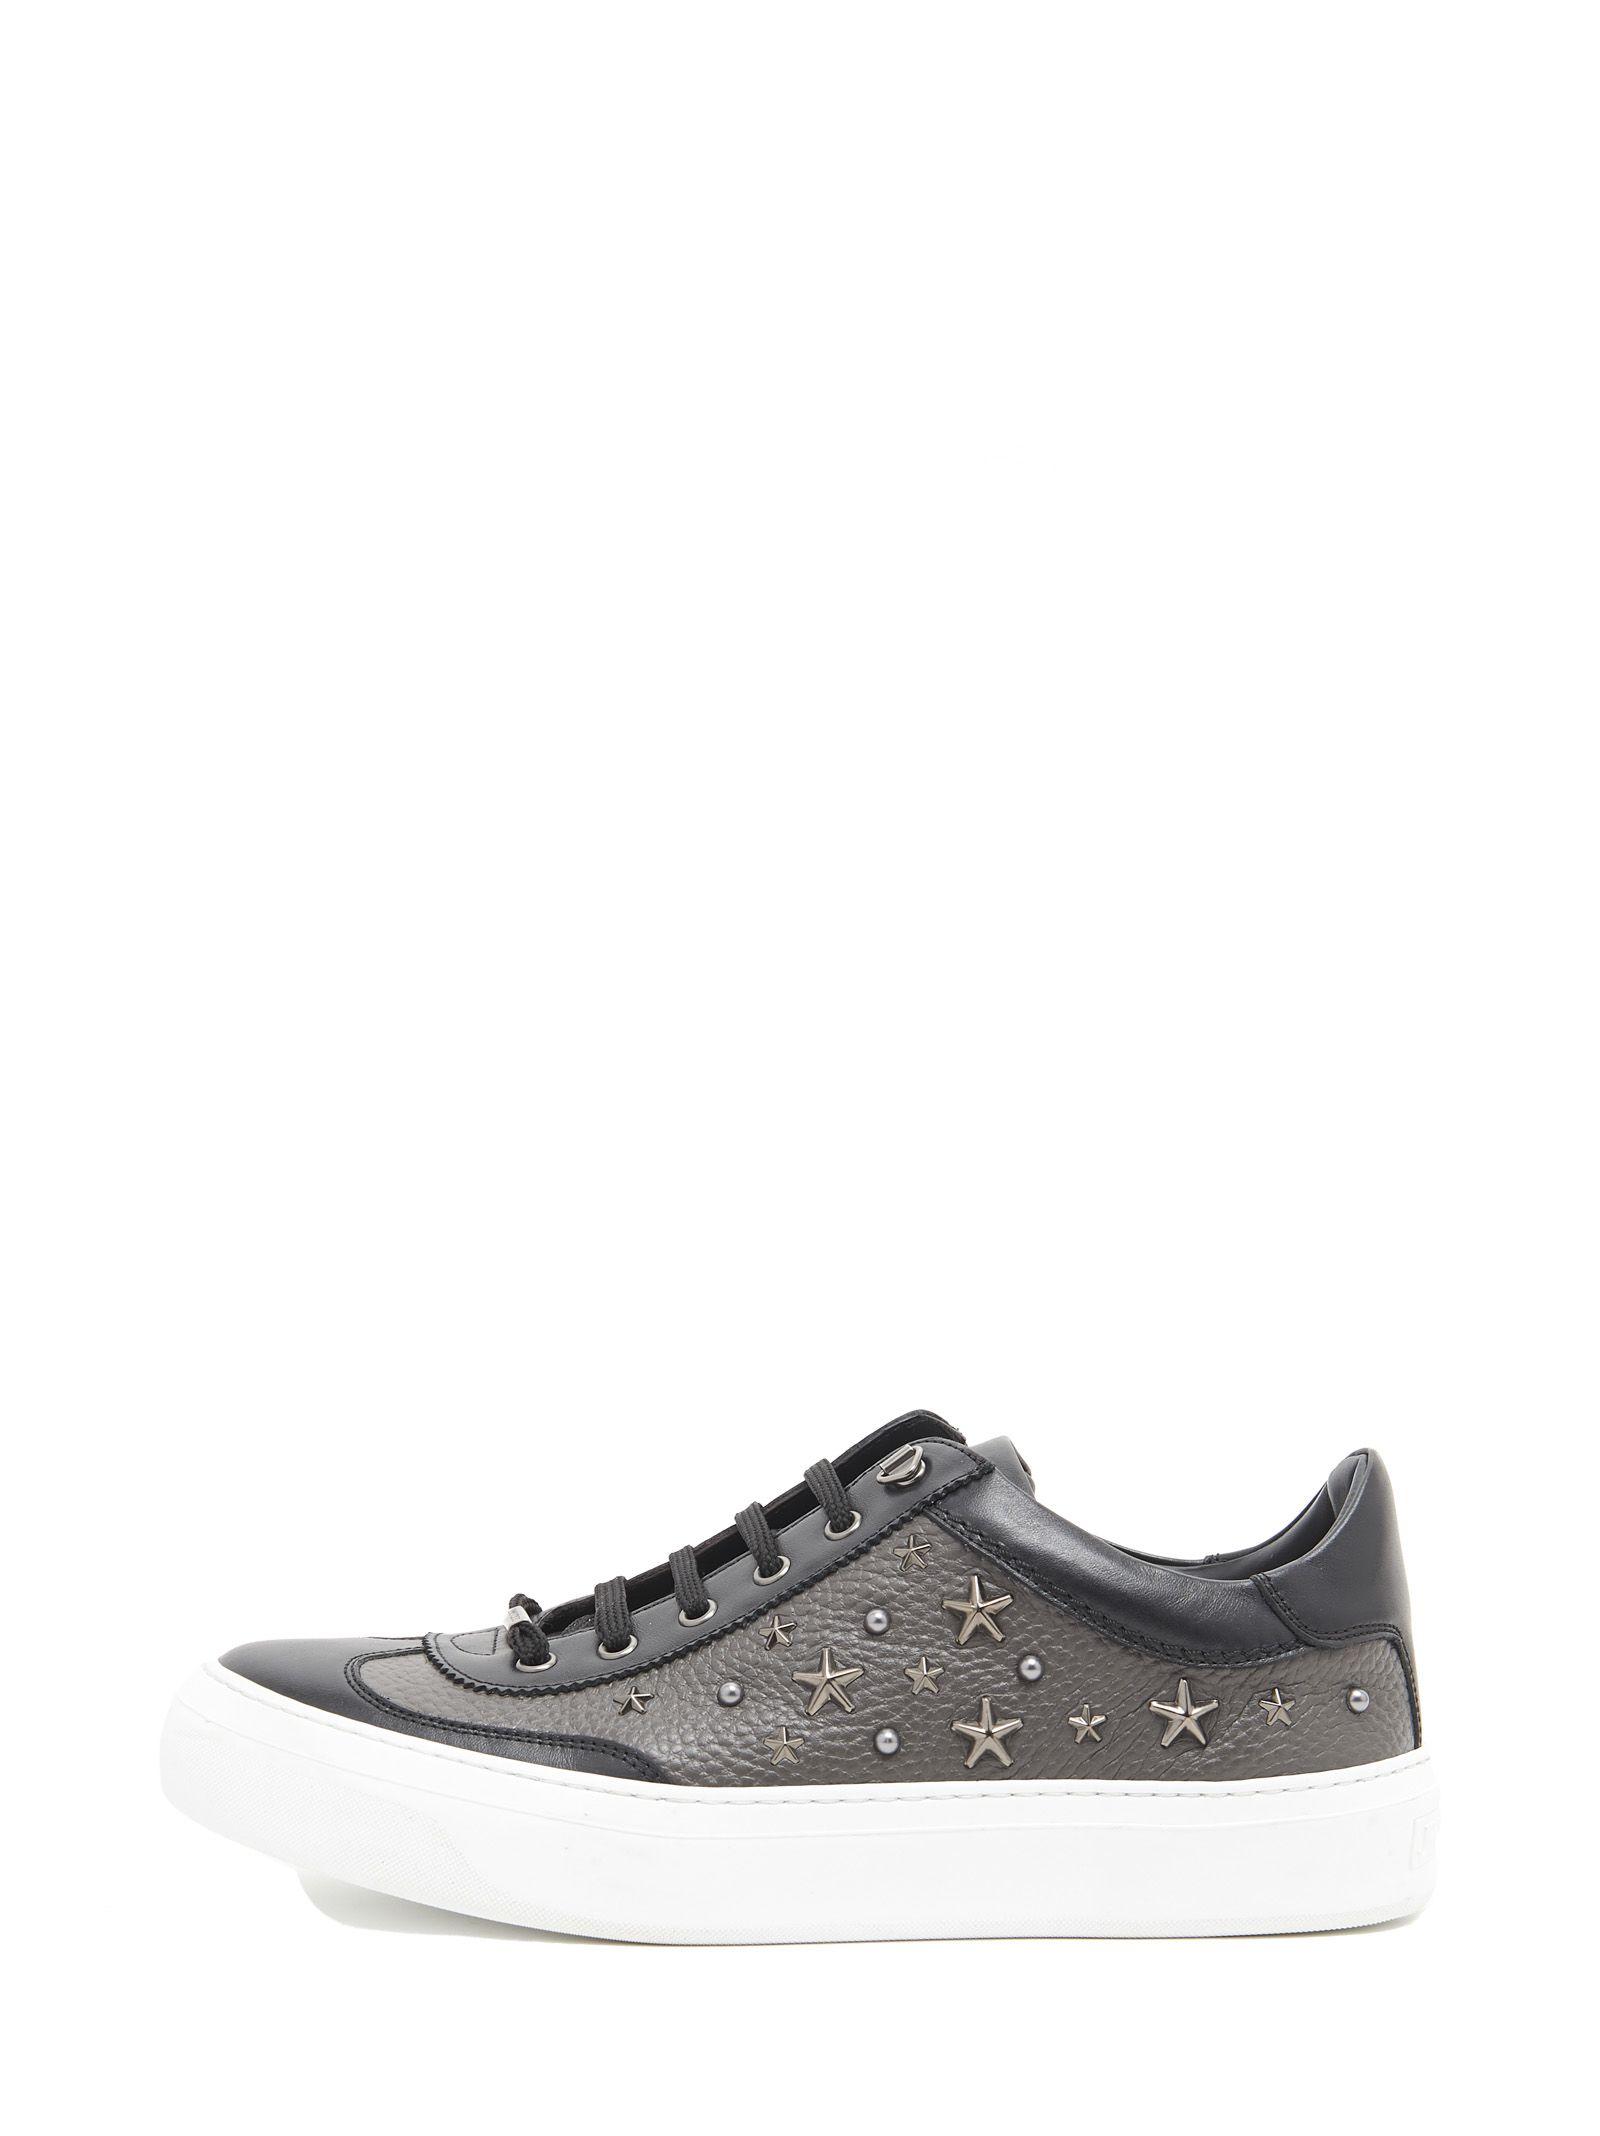 Jimmy Choo 'ace' Shoes